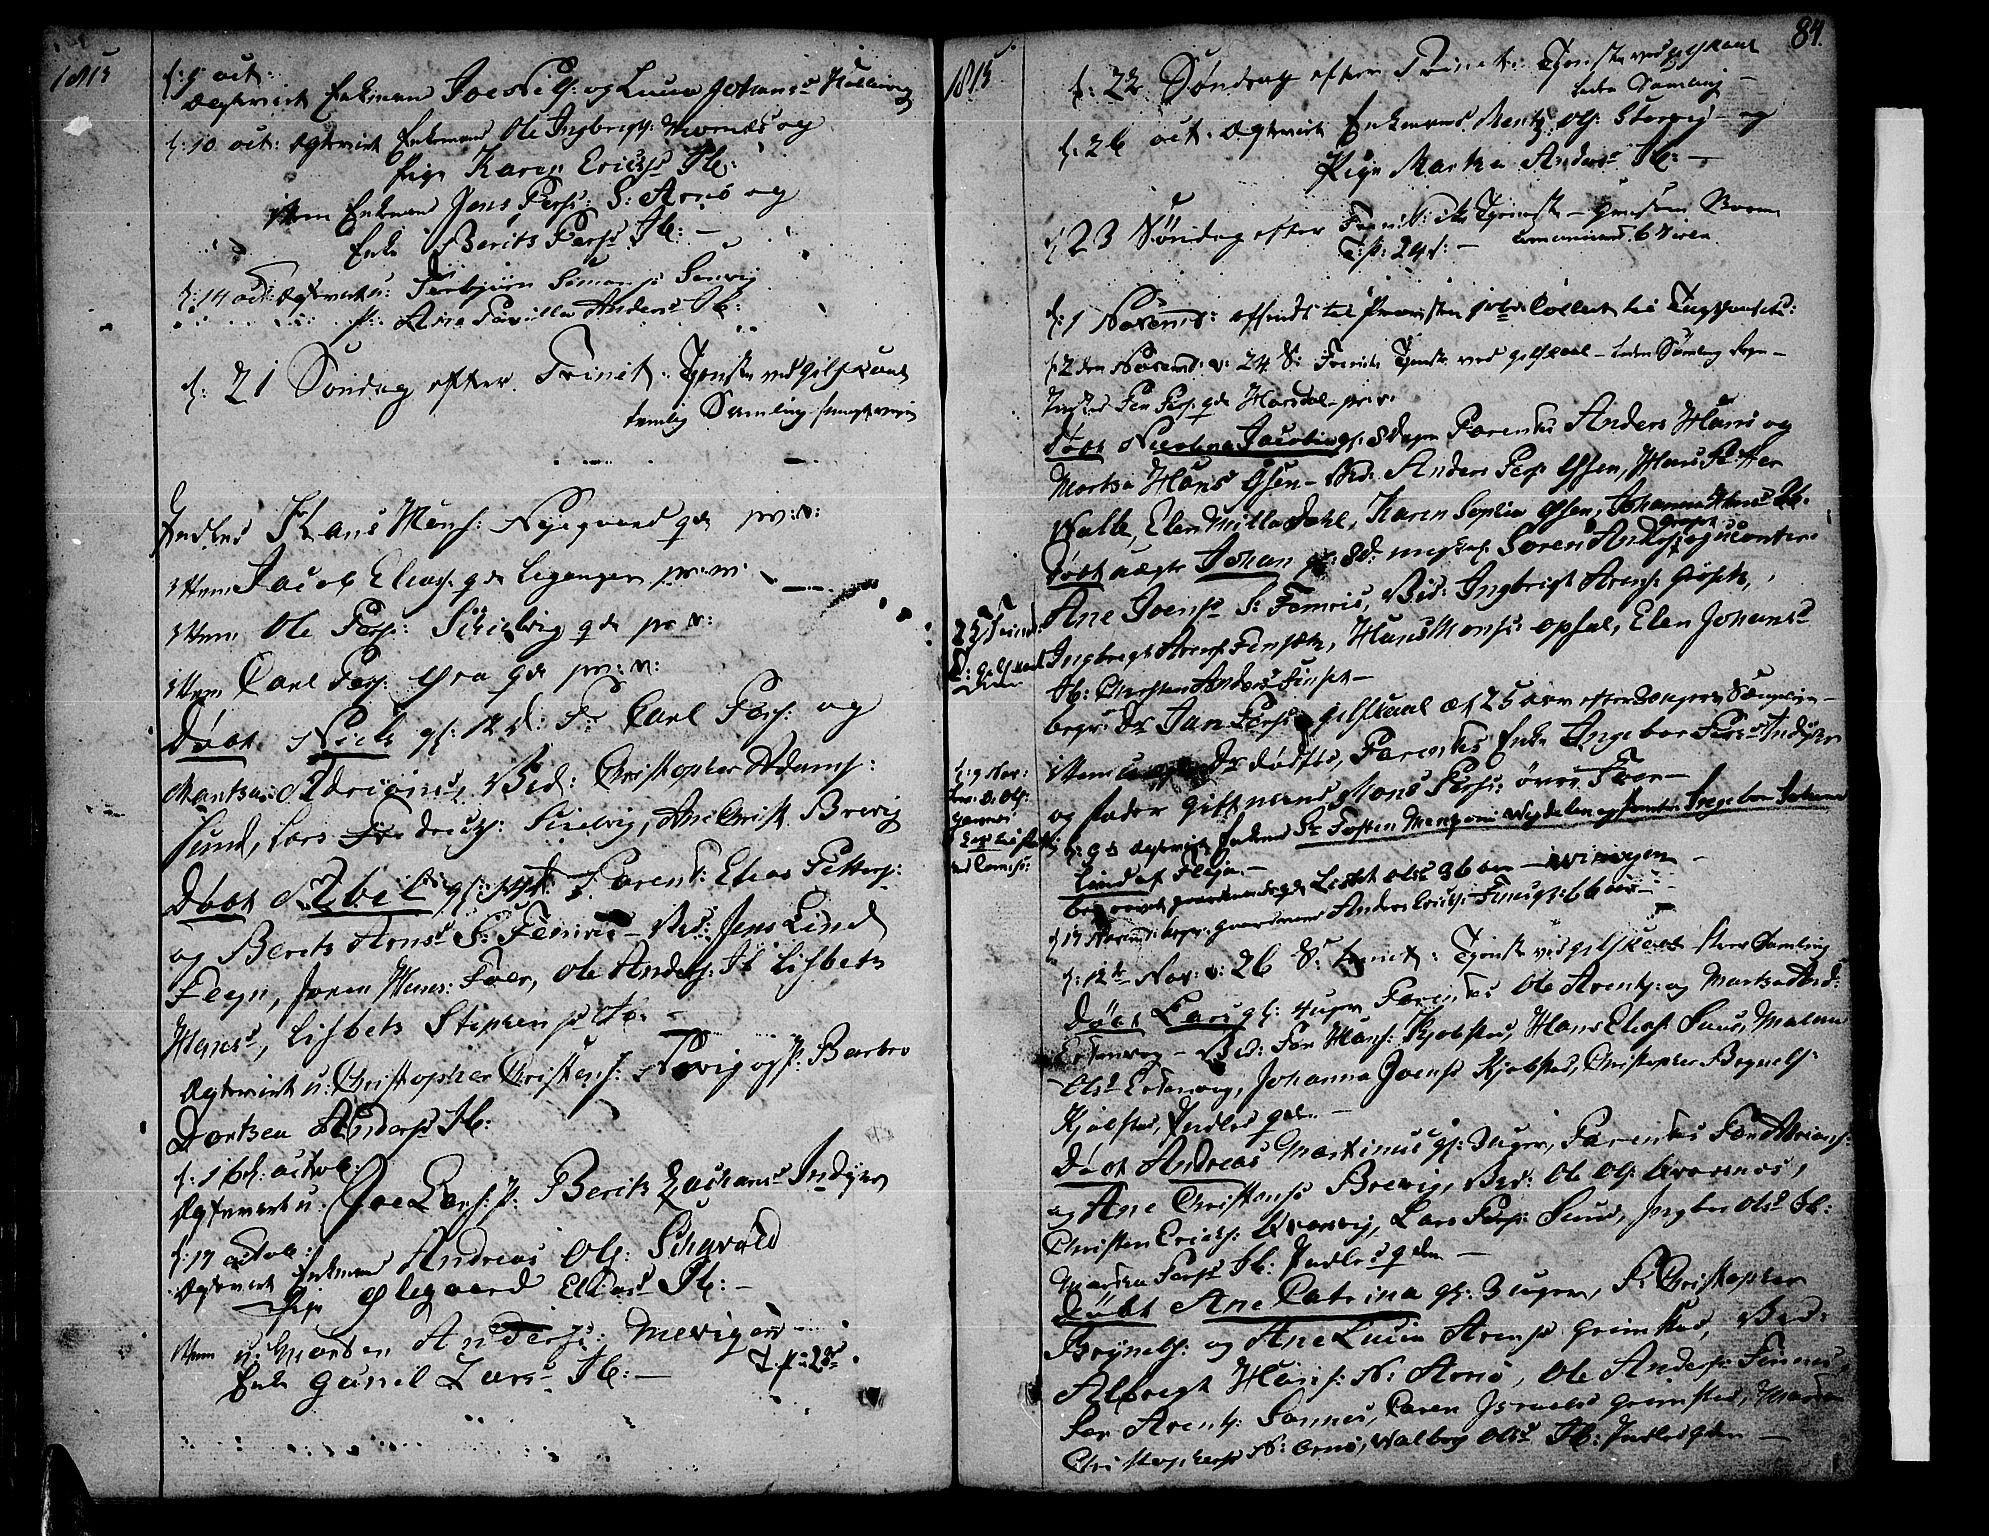 SAT, Ministerialprotokoller, klokkerbøker og fødselsregistre - Nordland, 805/L0095: Ministerialbok nr. 805A02, 1805-1826, s. 84